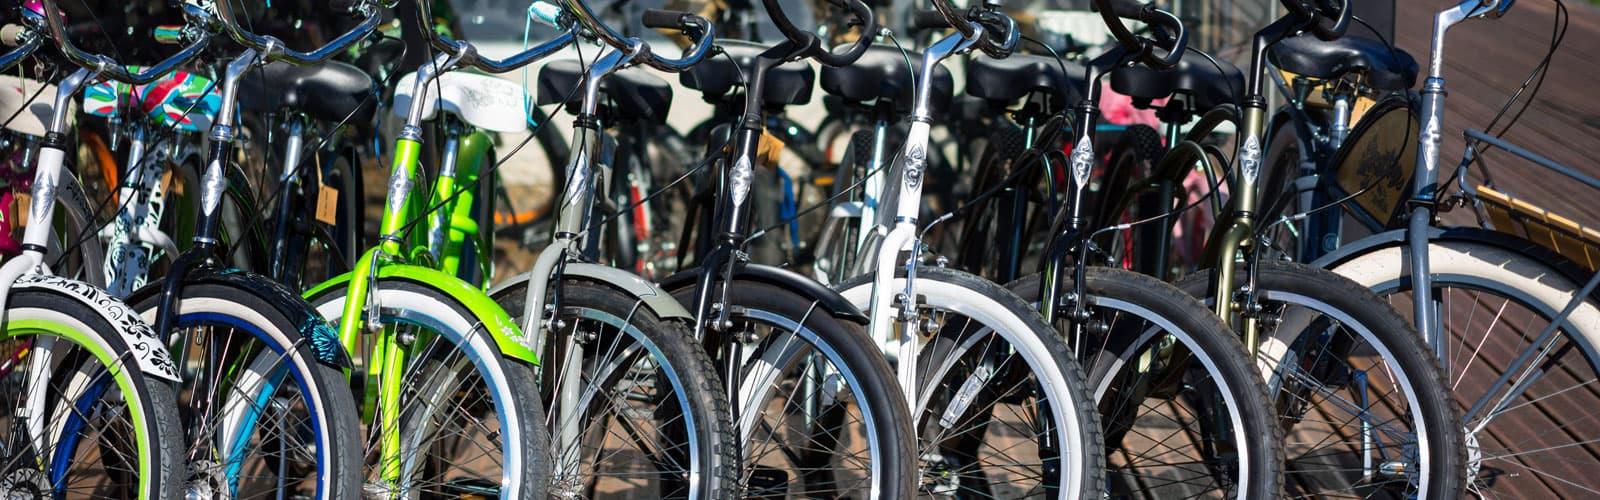 The Bike Fit Guide: Sierra Trading Post